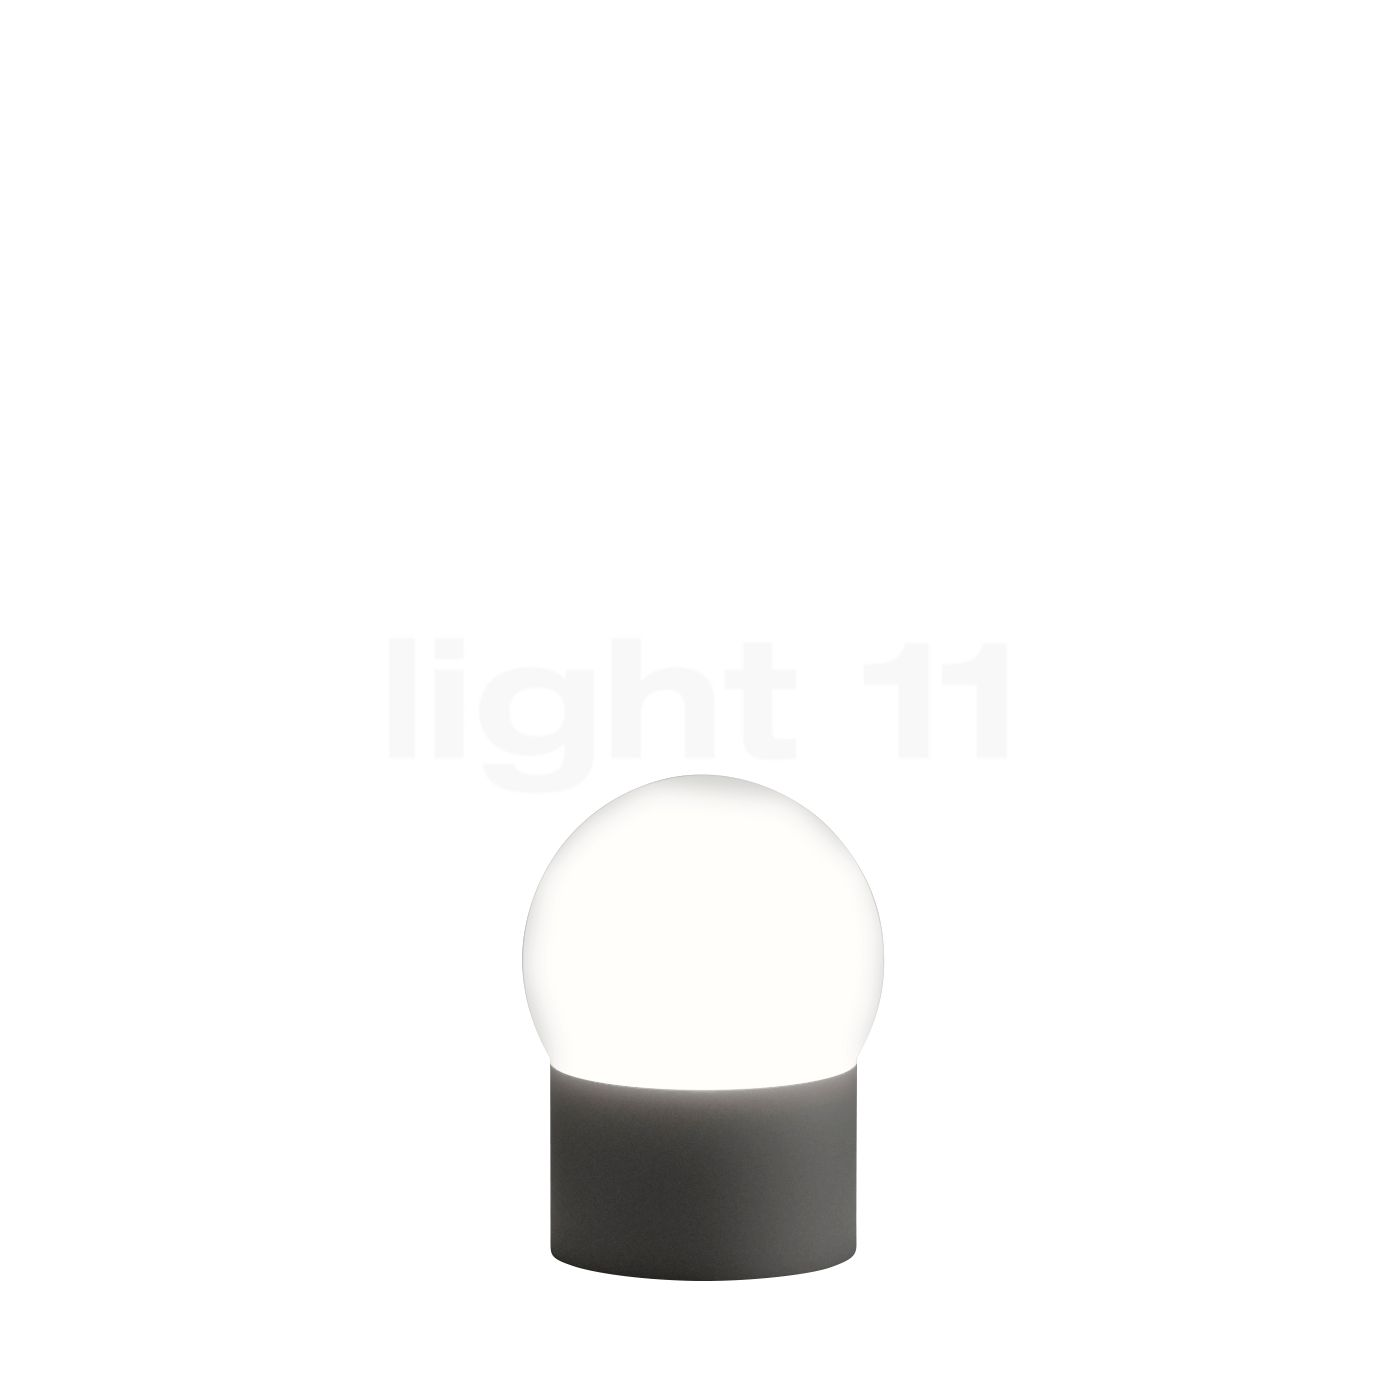 Vibia Lampe De Table June Led 4790 6yf7gYb